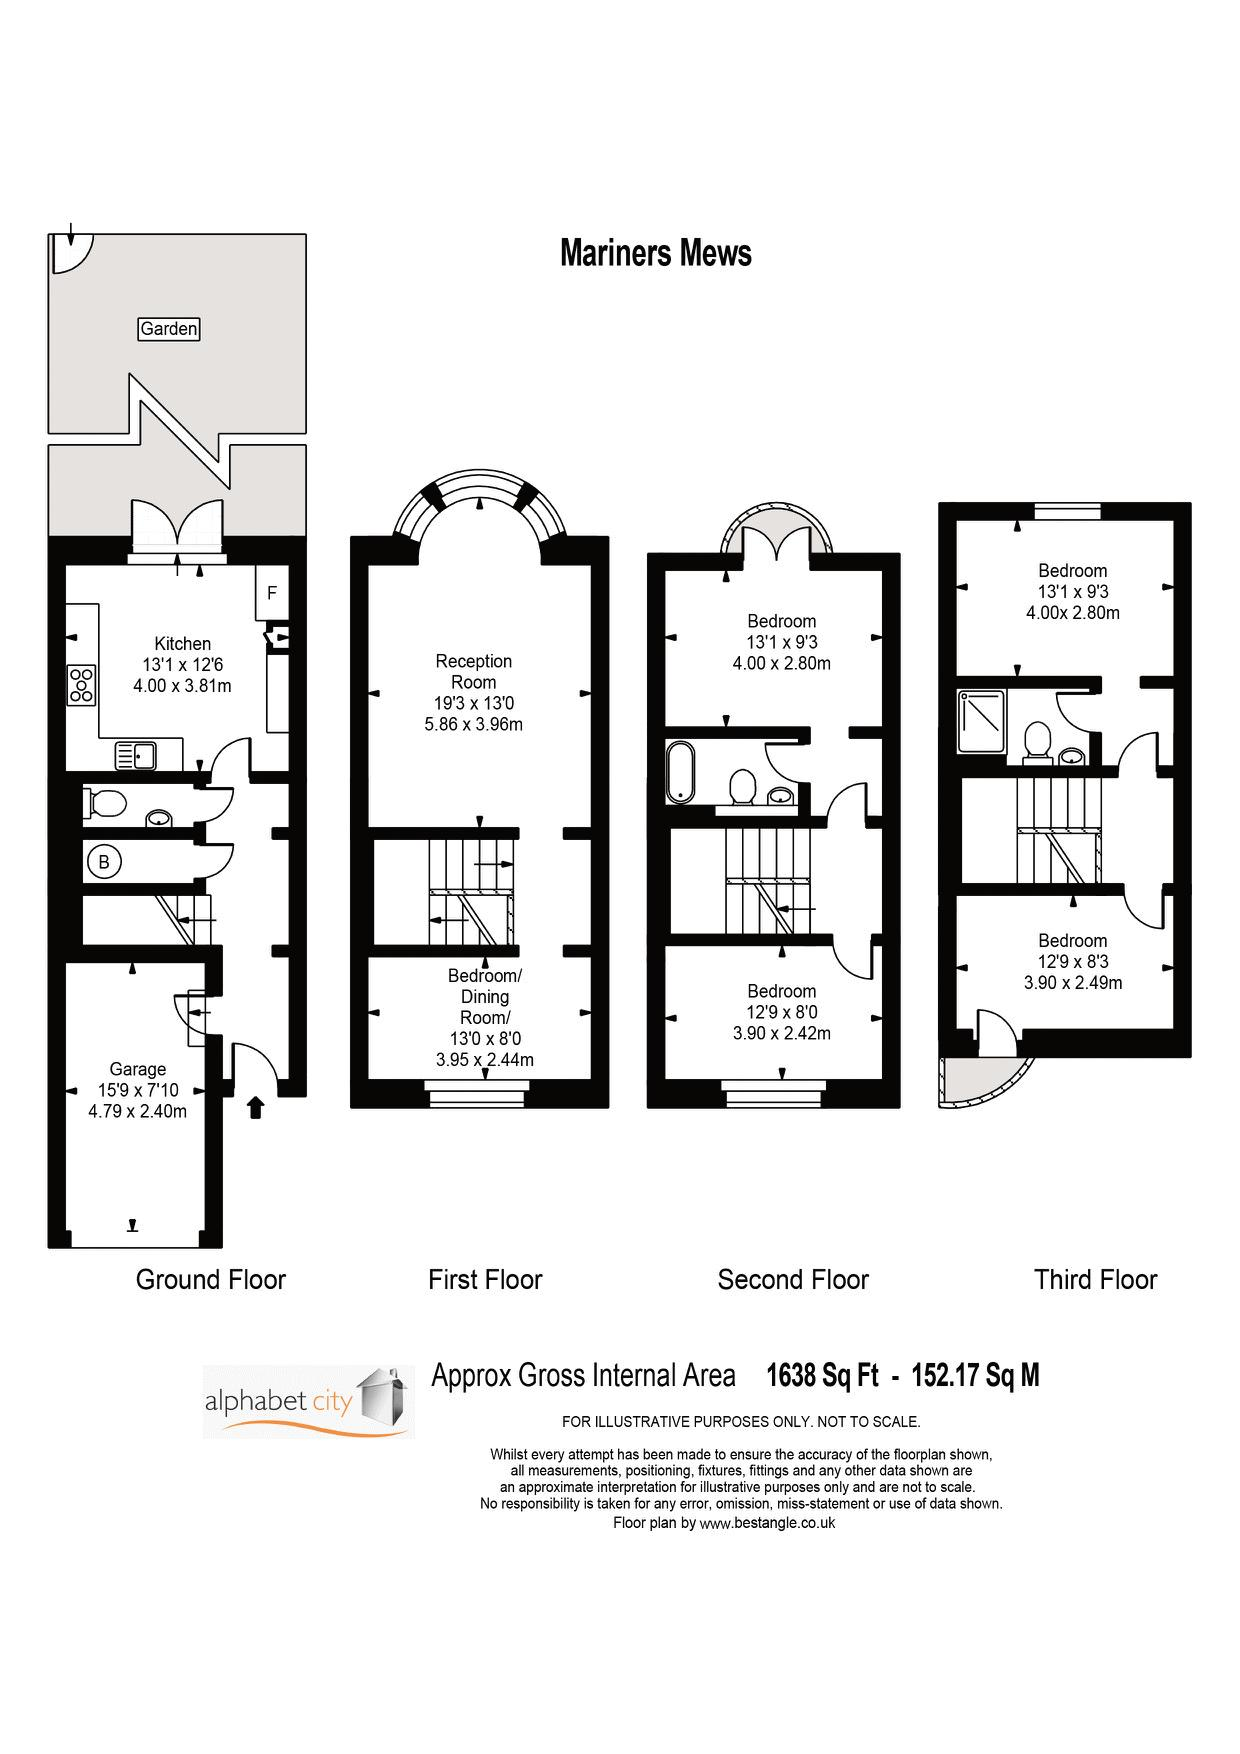 Floor Plan - Mariners - For illustration purposes